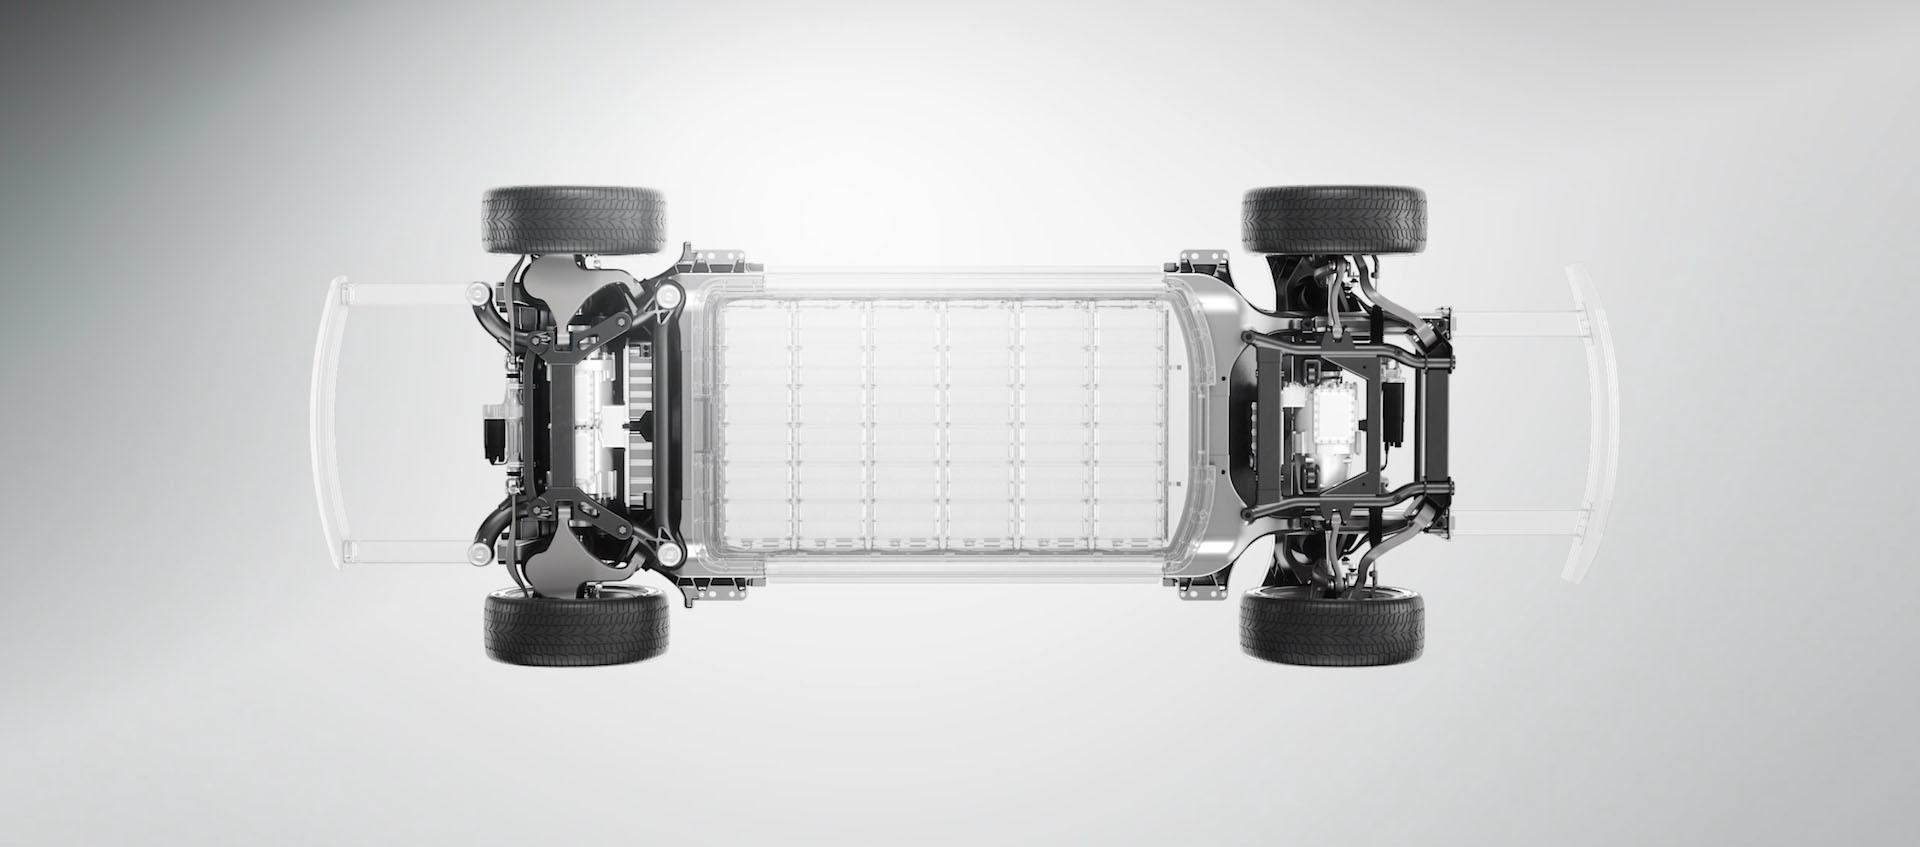 Faraday Future представила концепт модульной платформы электромобилей и суперкар FFZERO1 - 6